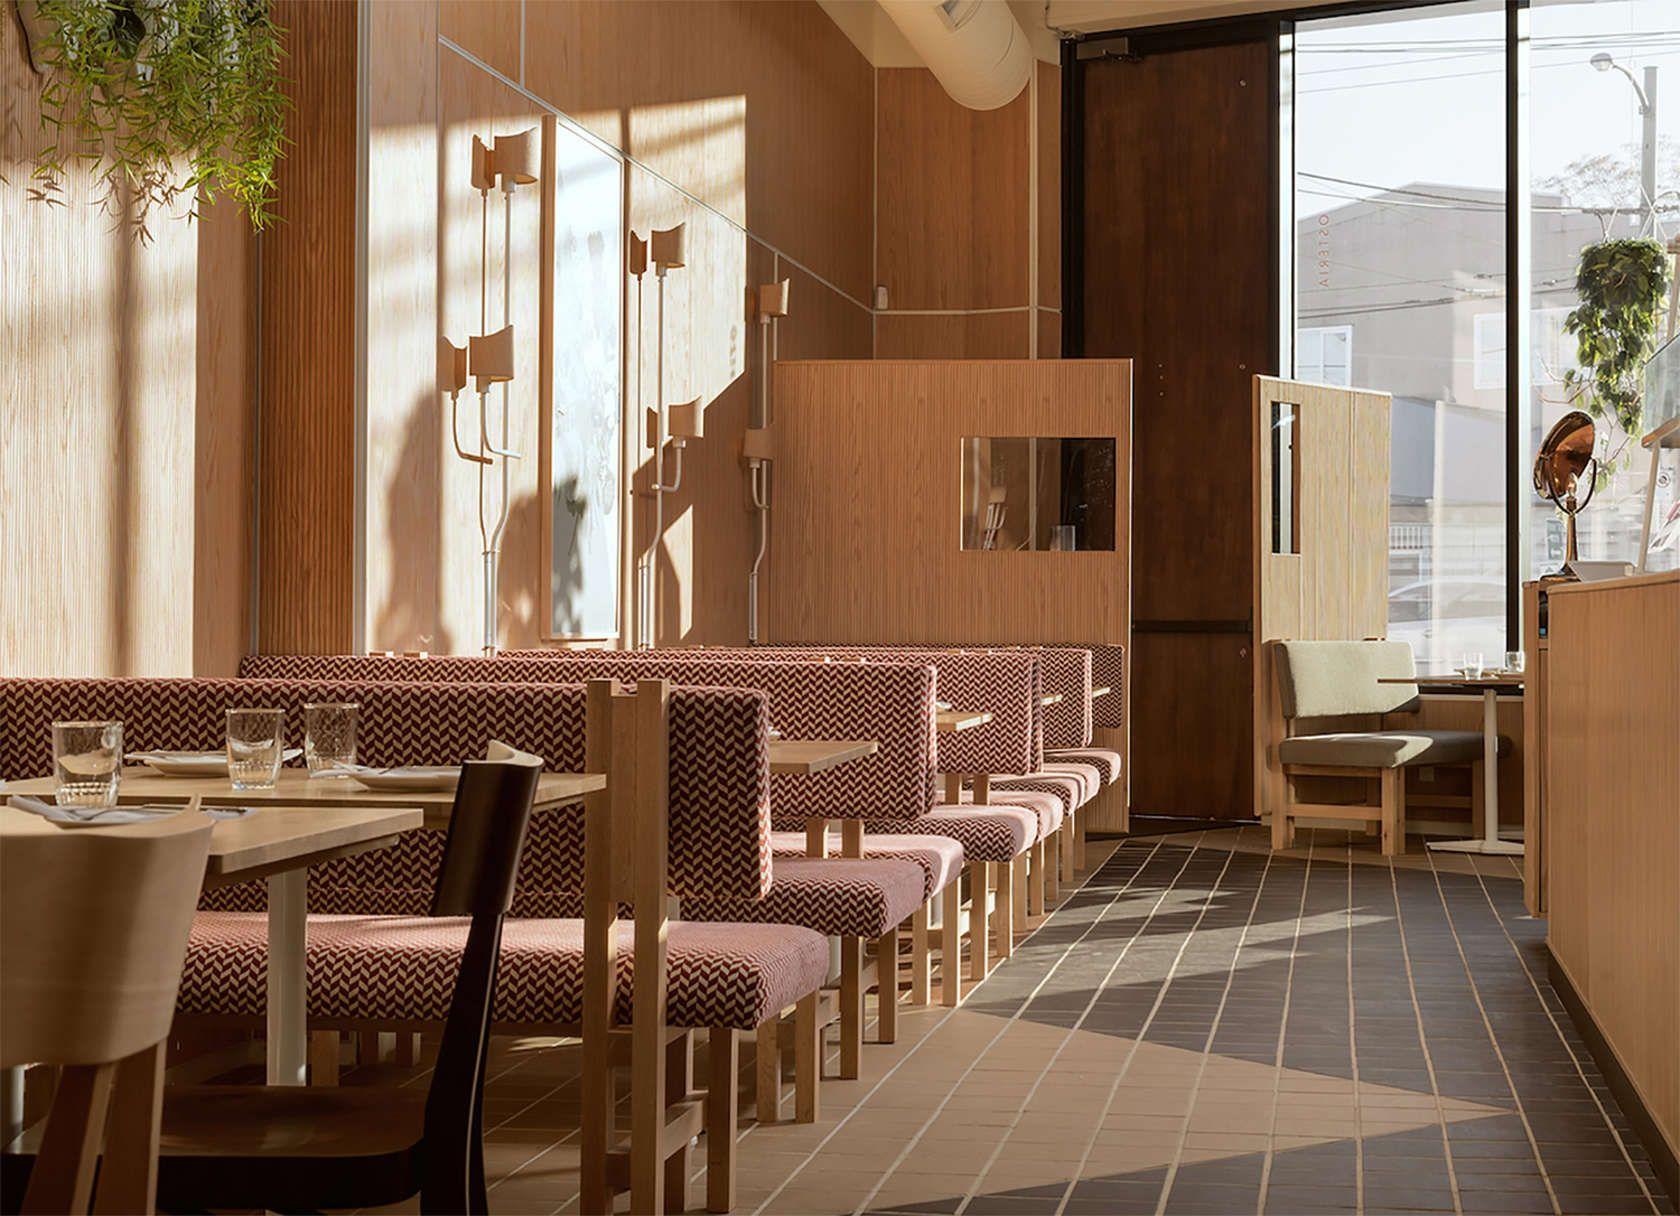 Restaurant With Large Window - Shindigs - Pinterest - Restaurants,